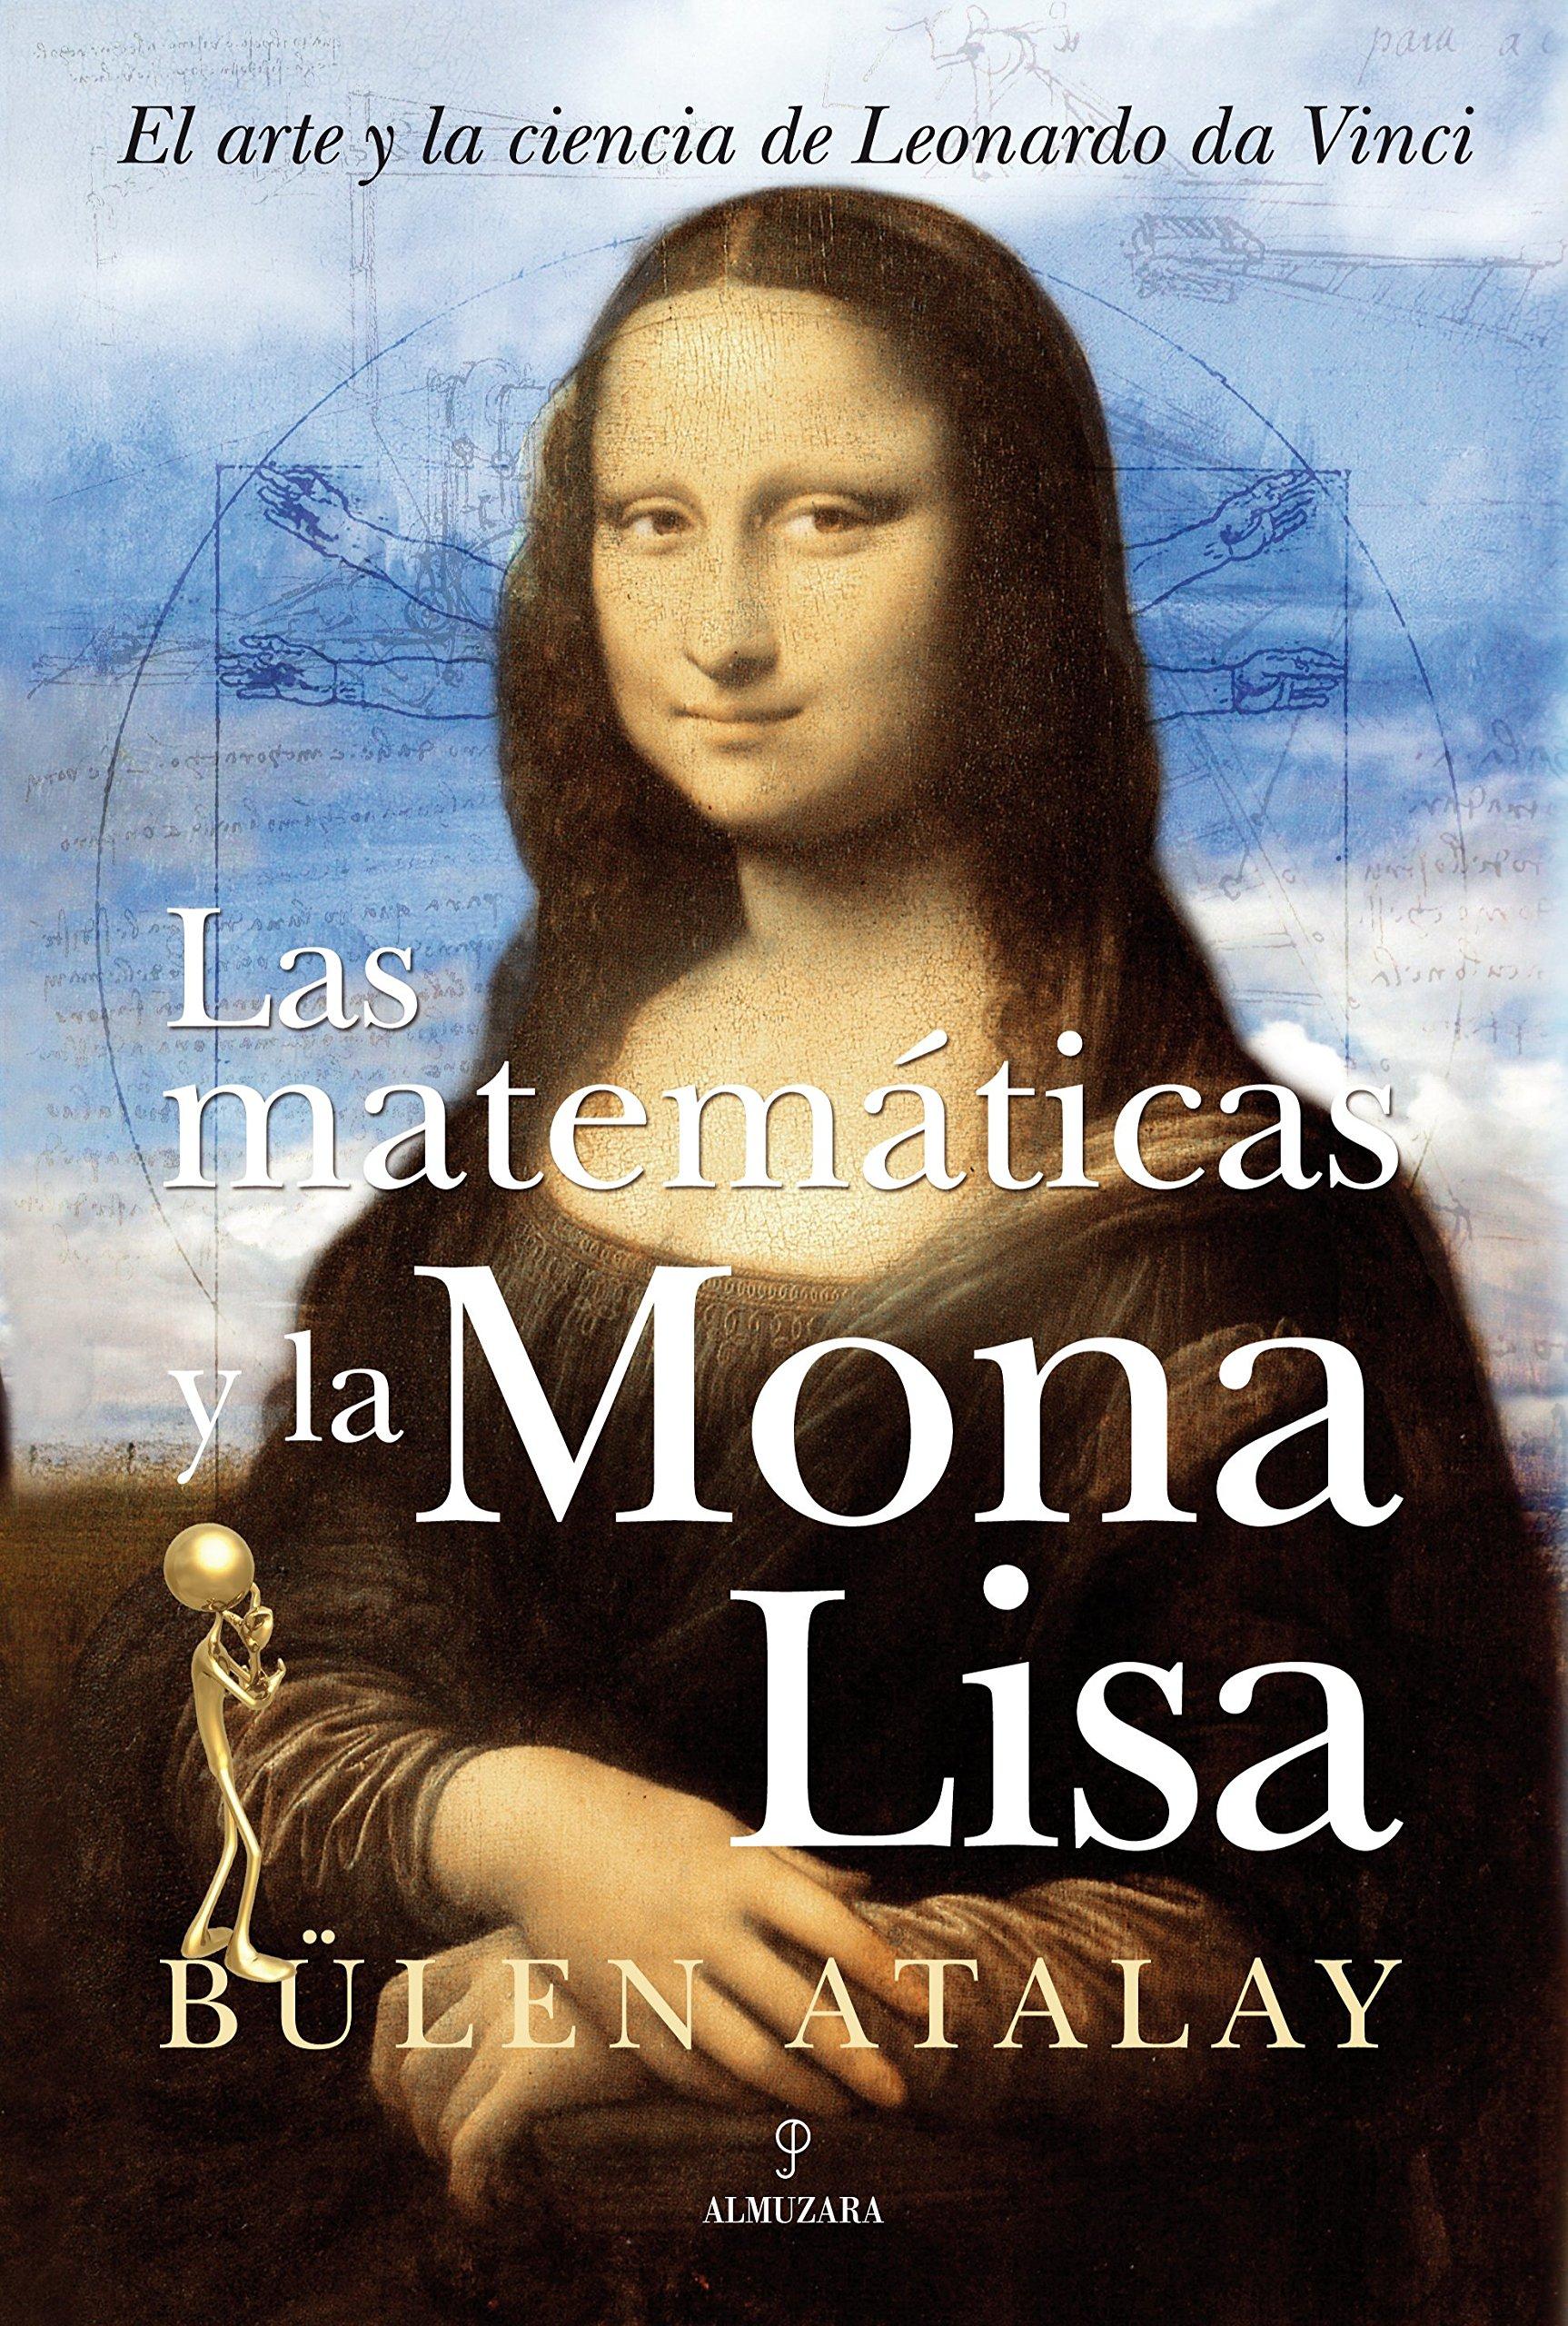 Las matematicas y la mona lisa/ The Mathematics of Mona Lisa (Spanish Edition) (Spanish) Hardcover – October 30, 2008